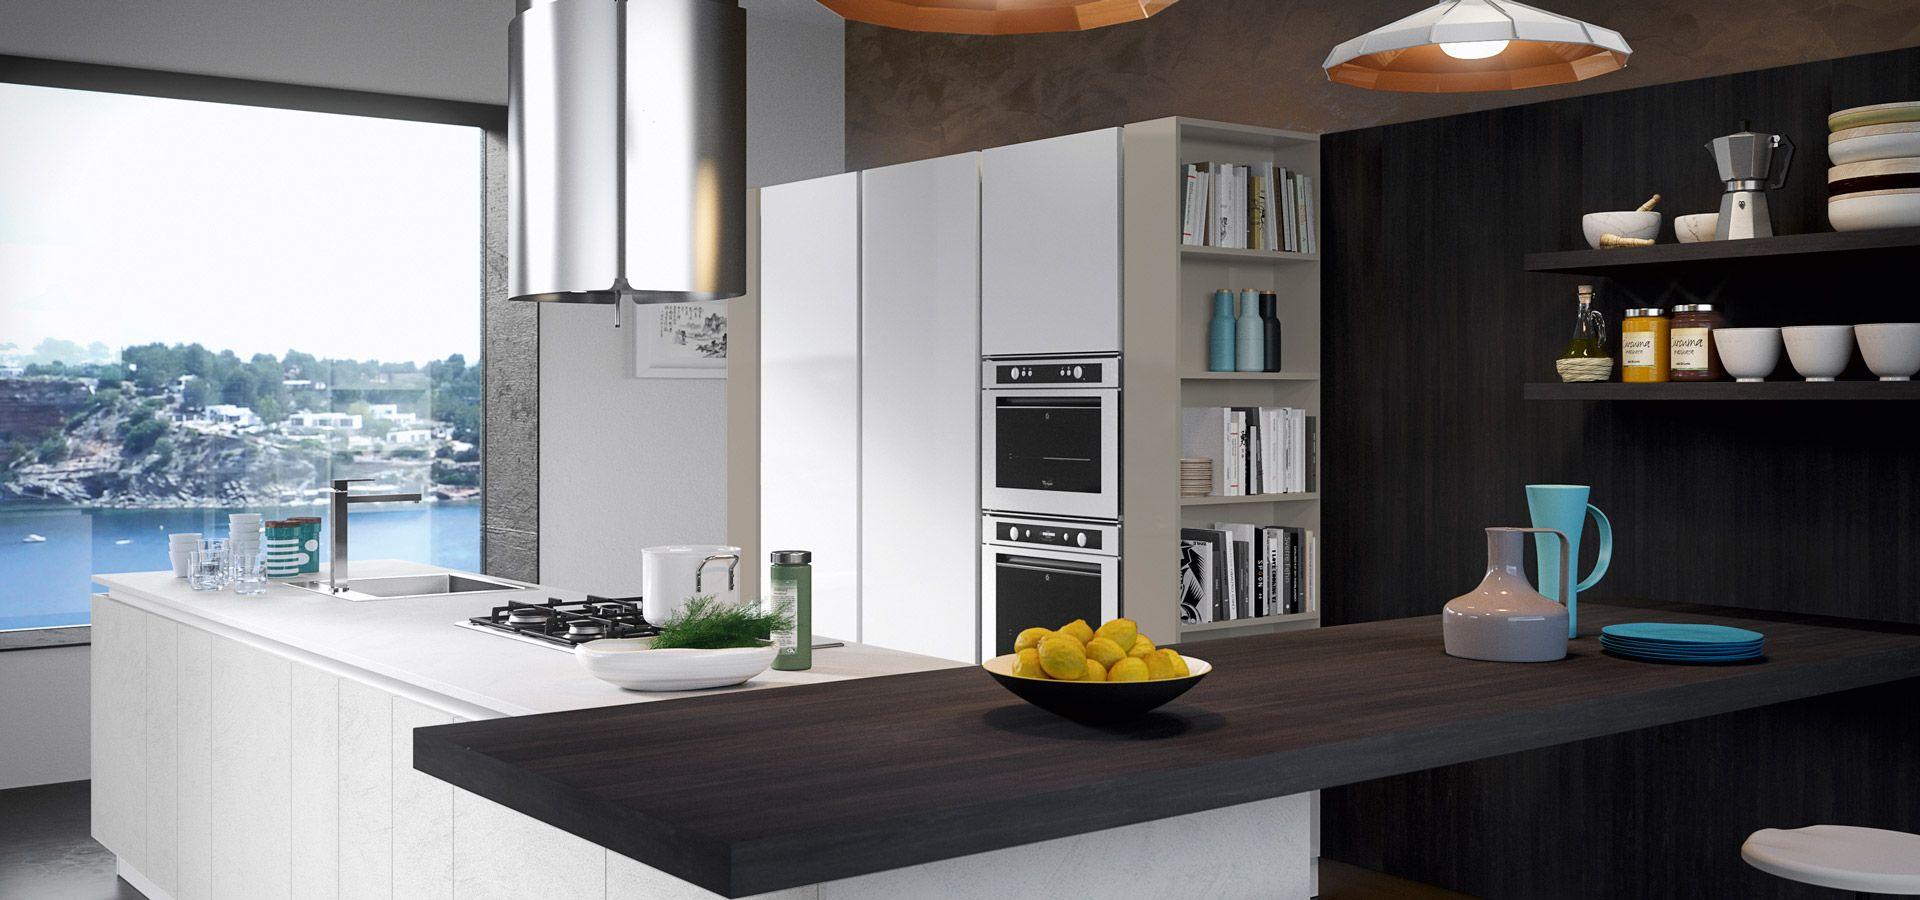 Cucina Moderna - KALI http://www.arredo3.it/cucine-moderne ...